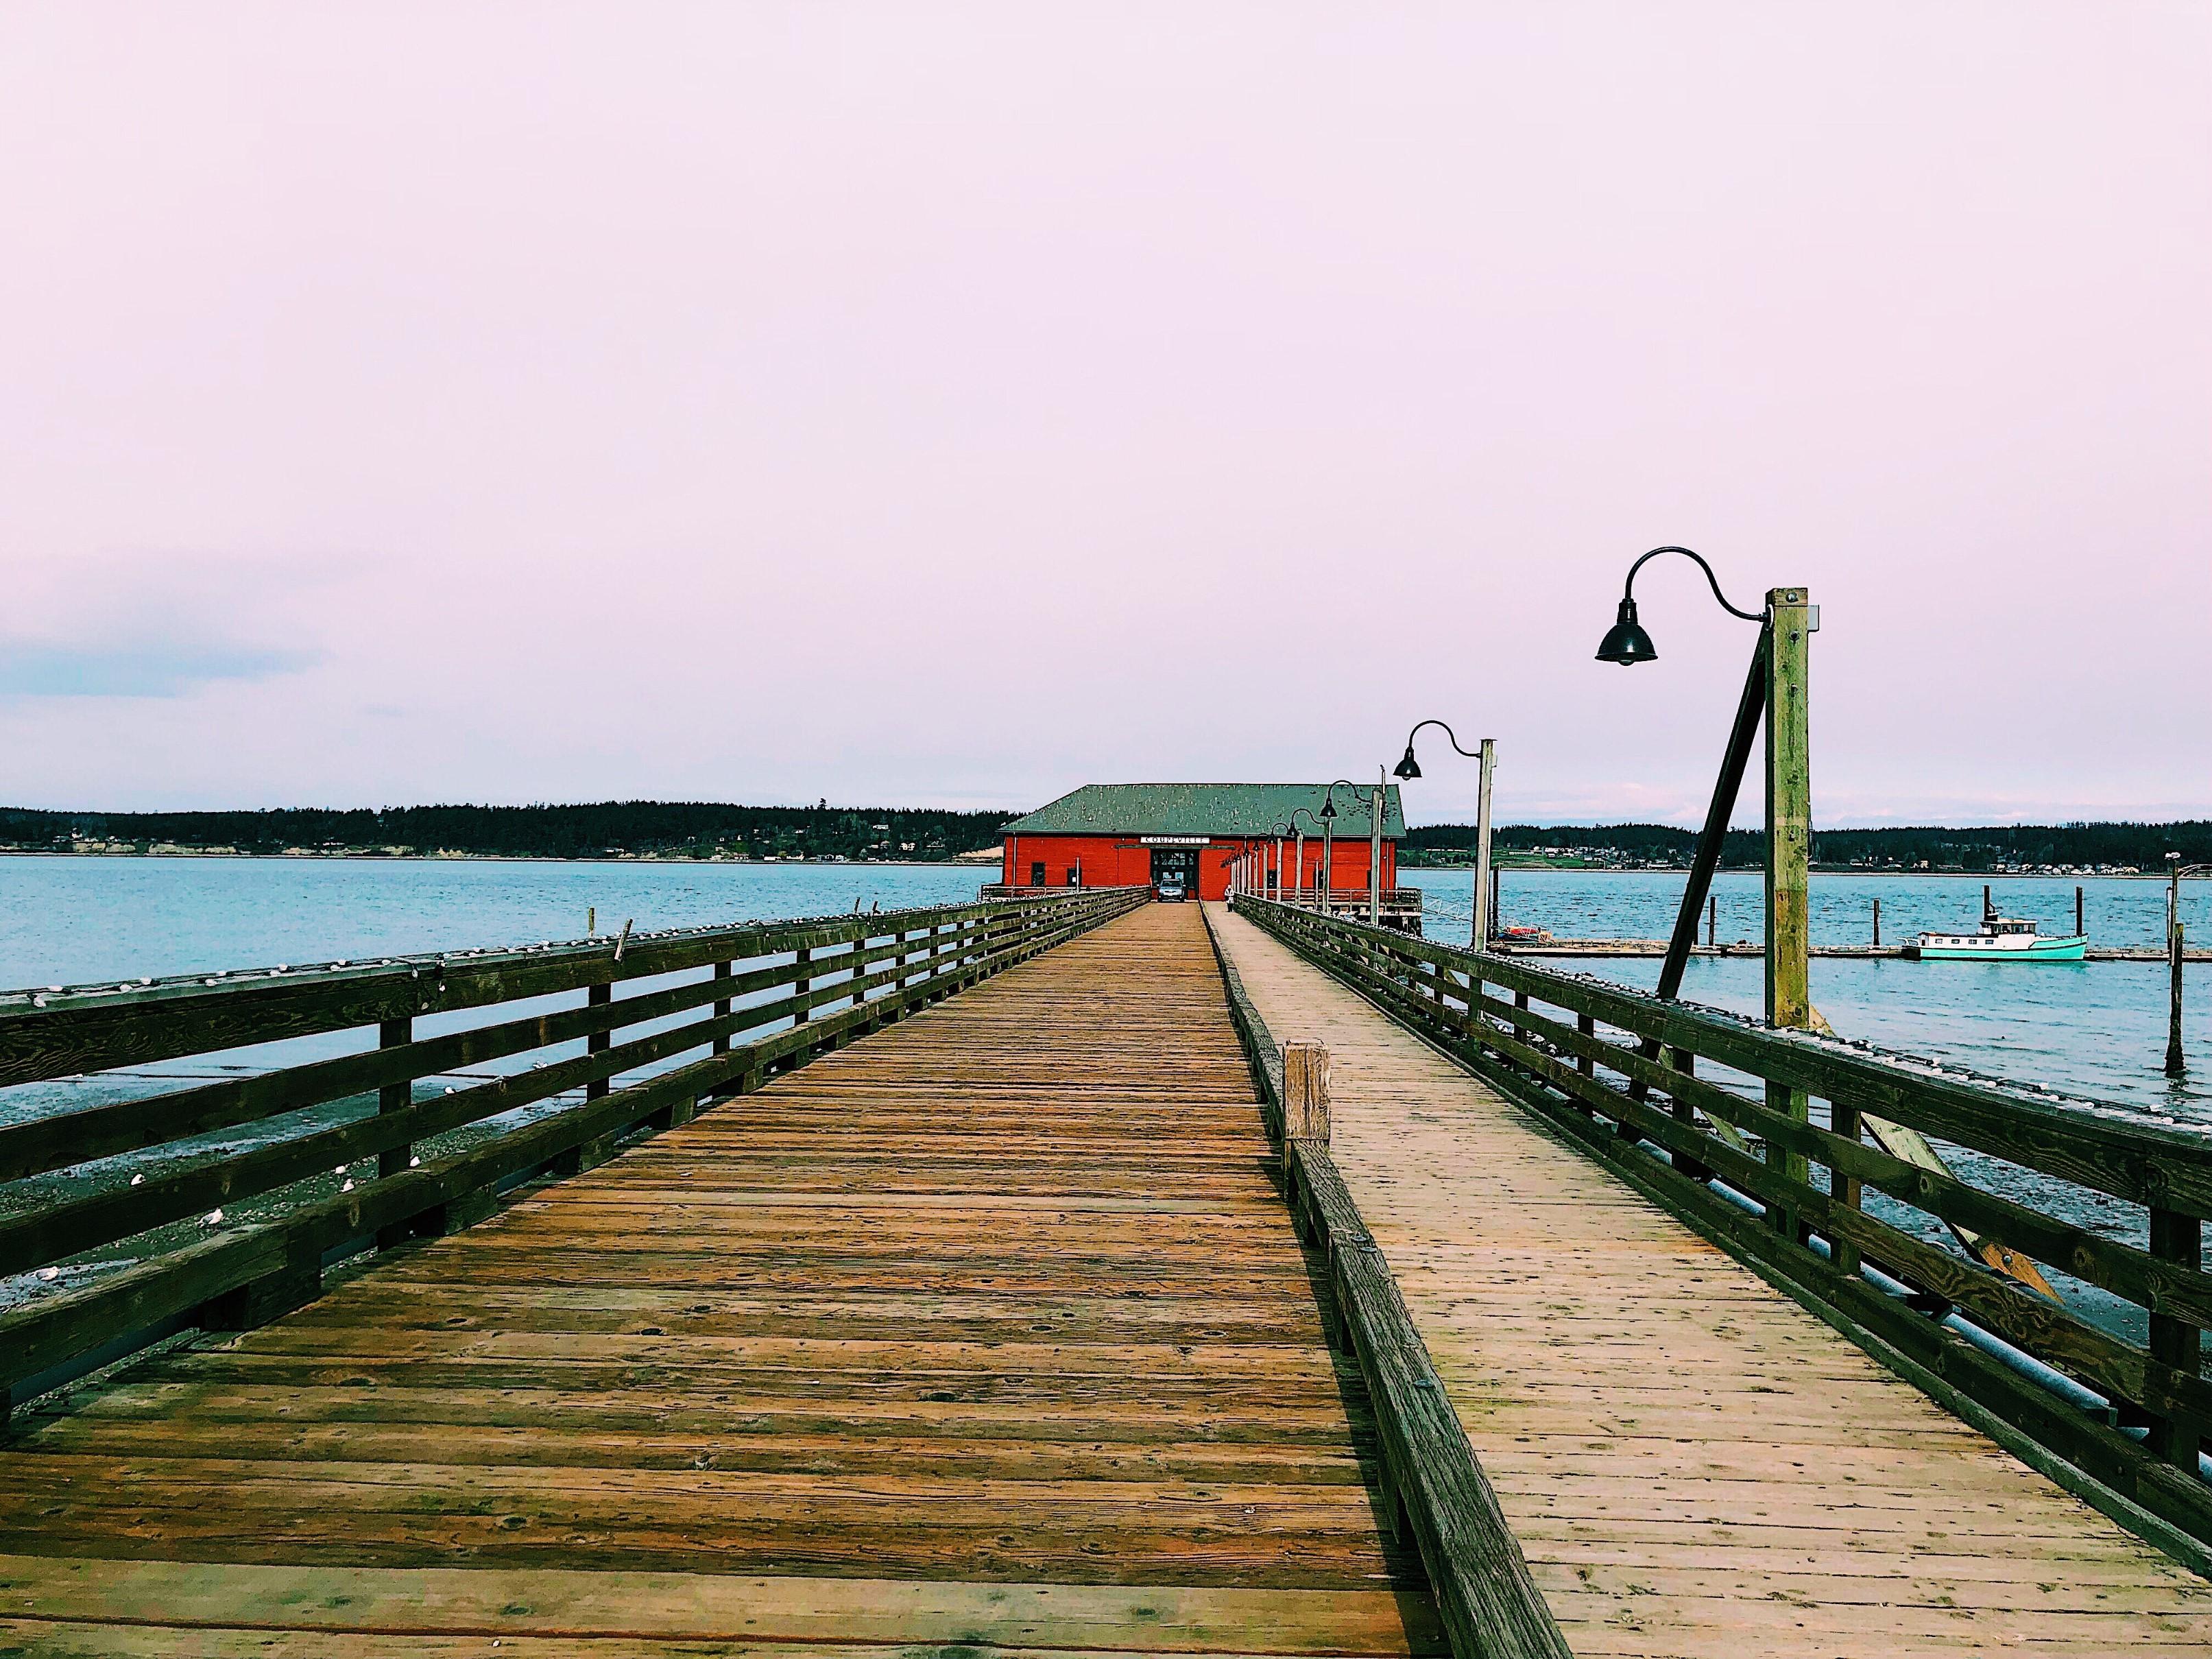 Coupeville warf, Red Barn, Ocean